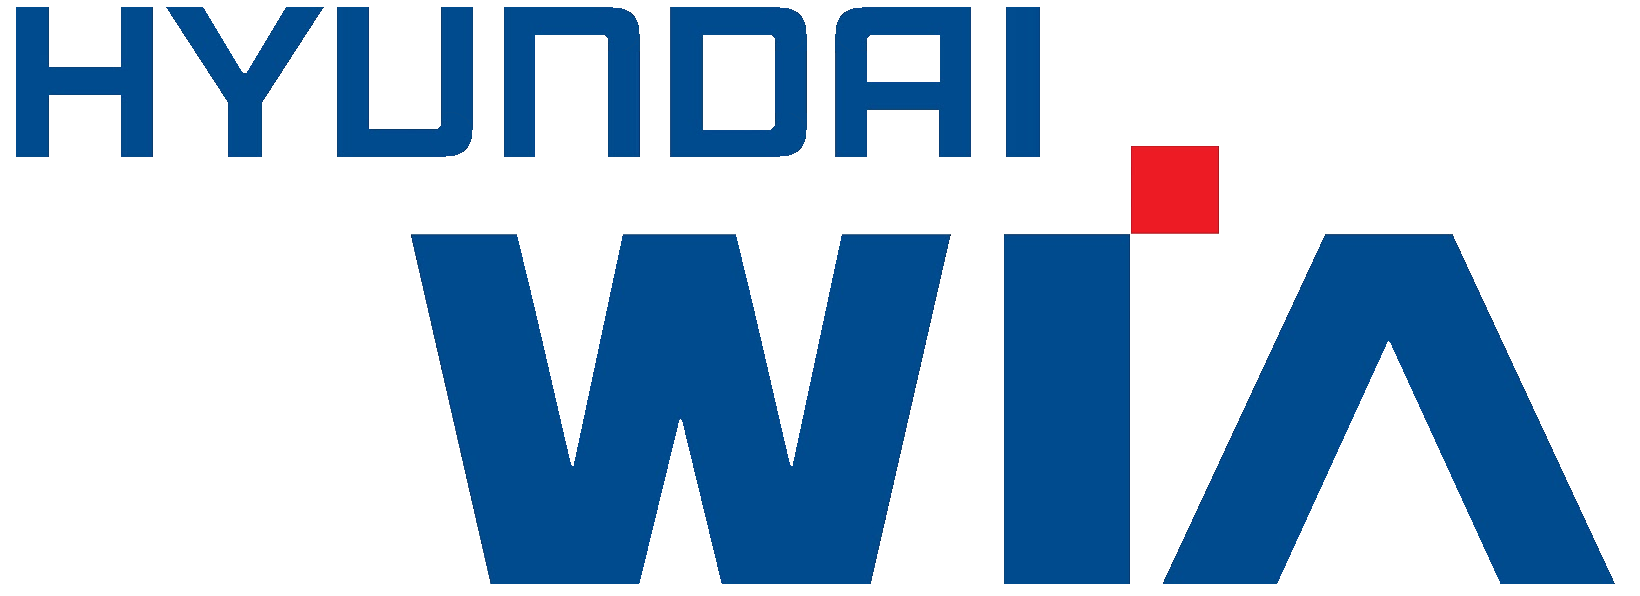 Logo HYUNDAI WIA - TRASPARENTE